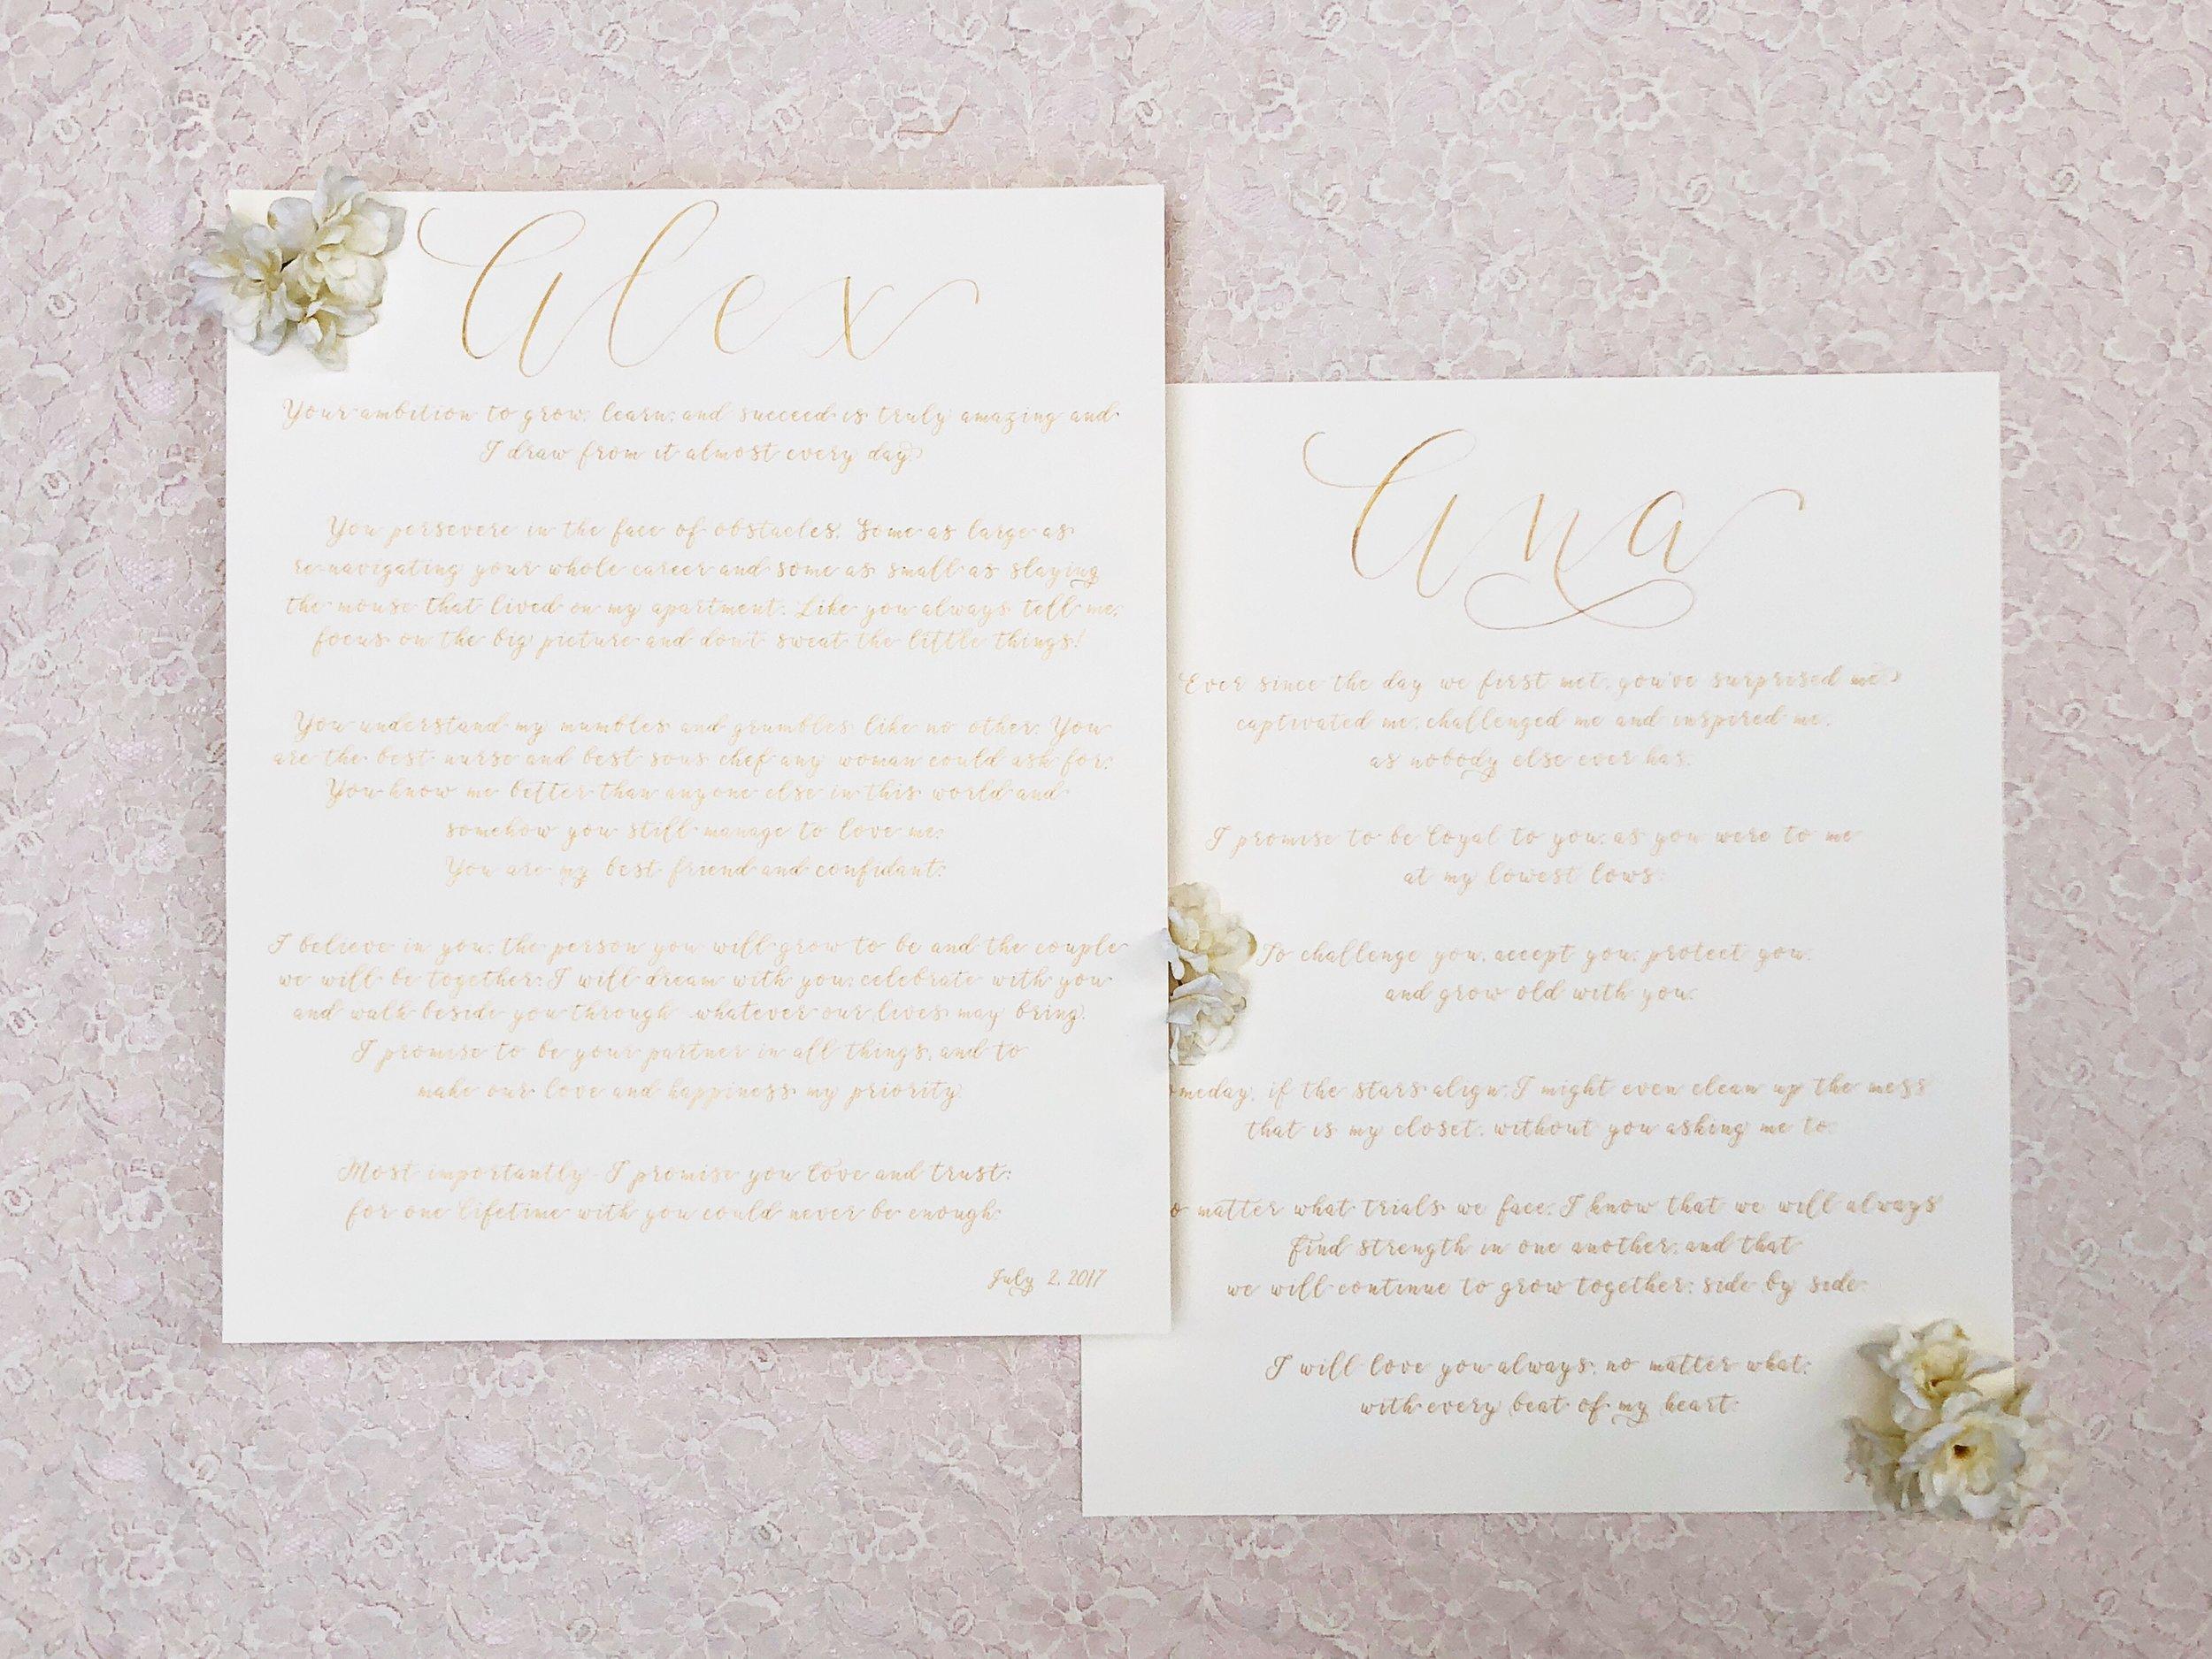 Central PA, York PA, JesSmith Designs, custom, wedding, invitations, bridal, Harrisburg, hanover, calligraphy, baltimore, wedding invitations, lancaster, gettysburg, 06-17 06.44.02.jpg